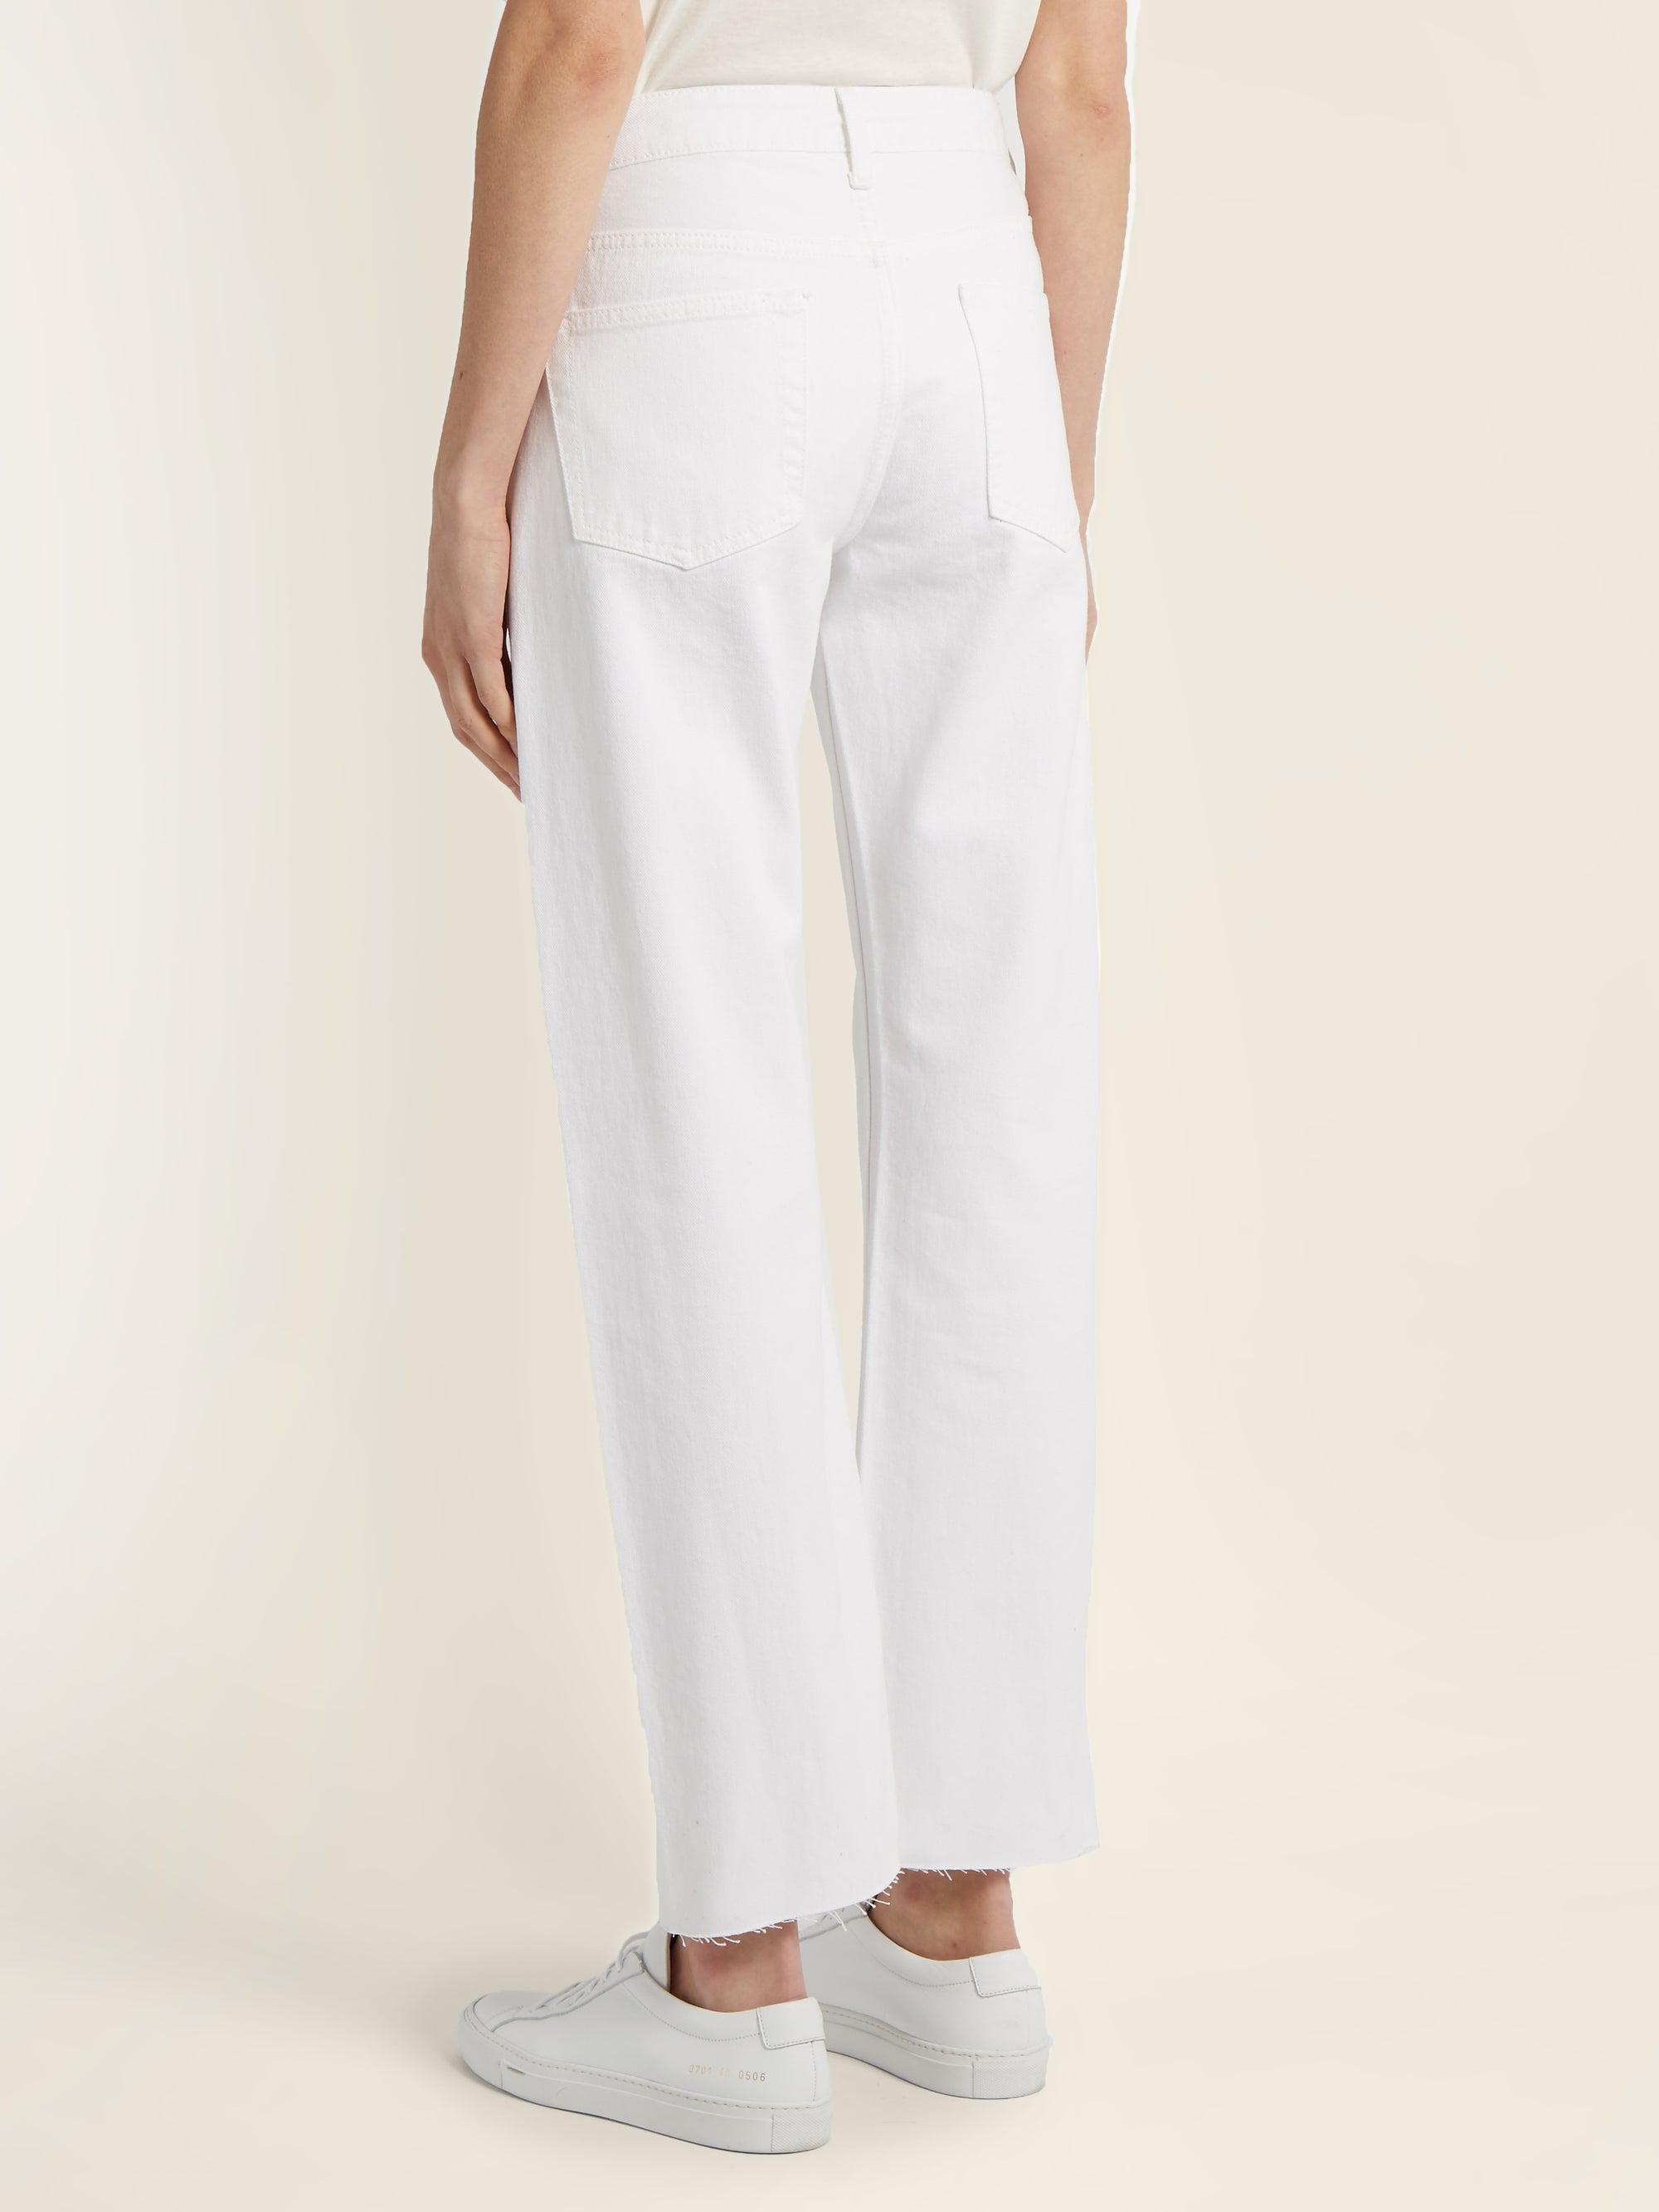 Raey Denim Press Straight-leg Jeans in White